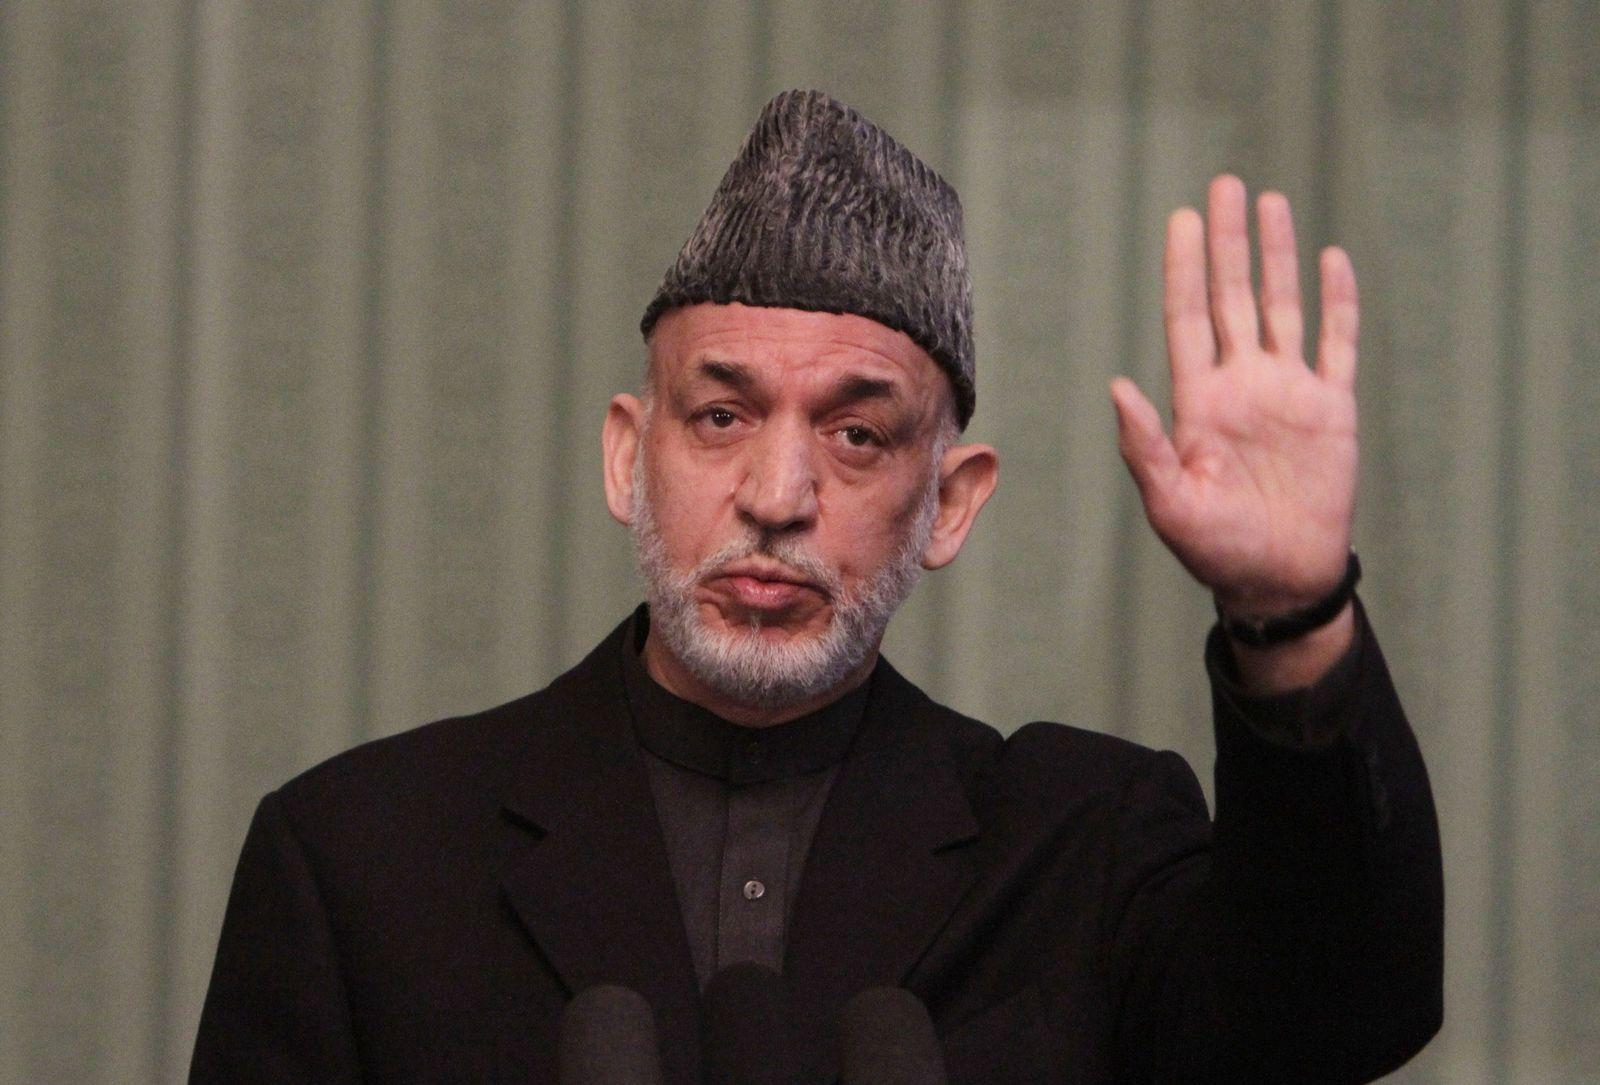 Hamid Karzai/Afghanistan